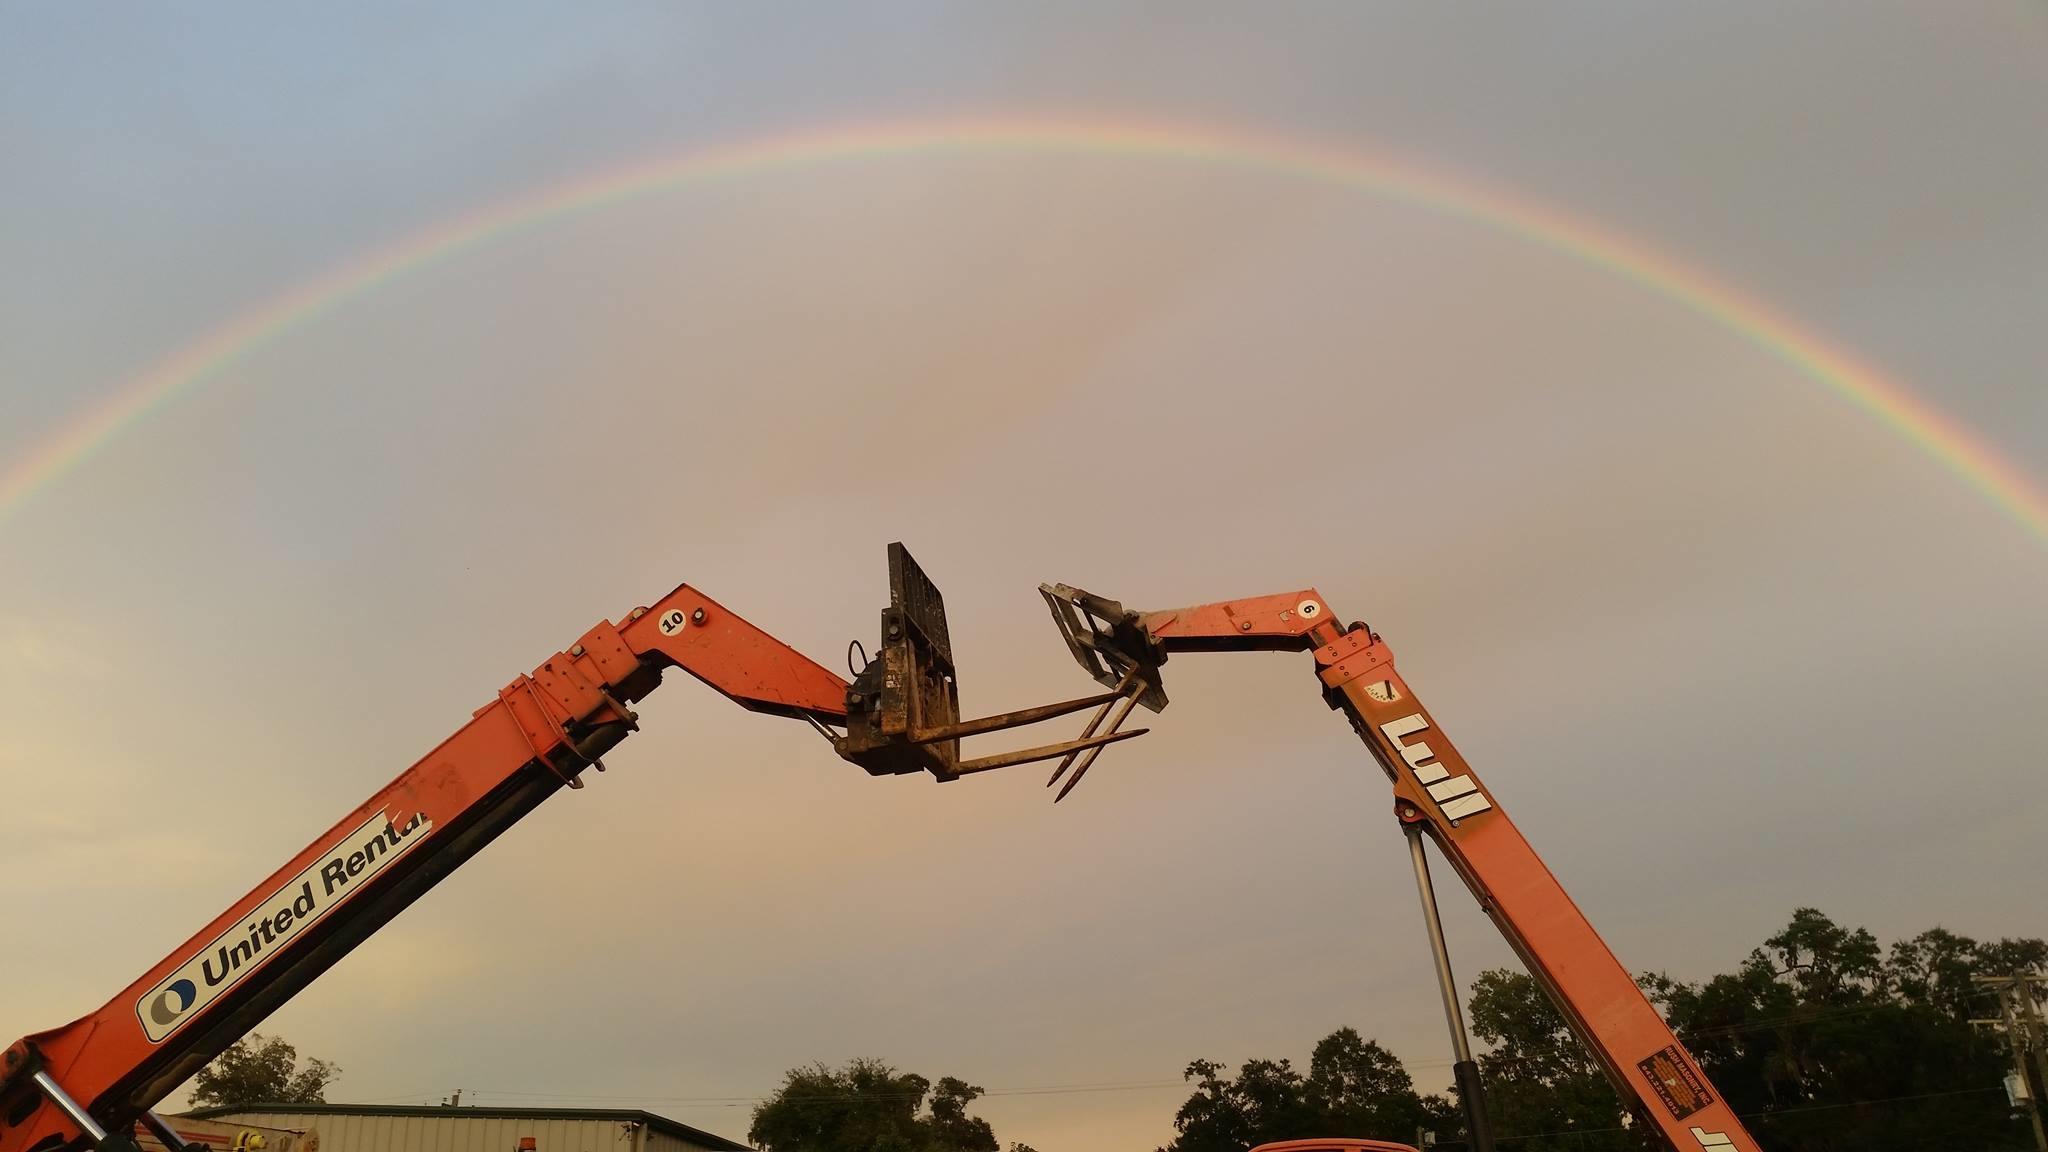 Toyota Forklift Charleston Sc >> Lowcountry Equipment Repair, LLC, North Charleston South Carolina (SC) - LocalDatabase.com